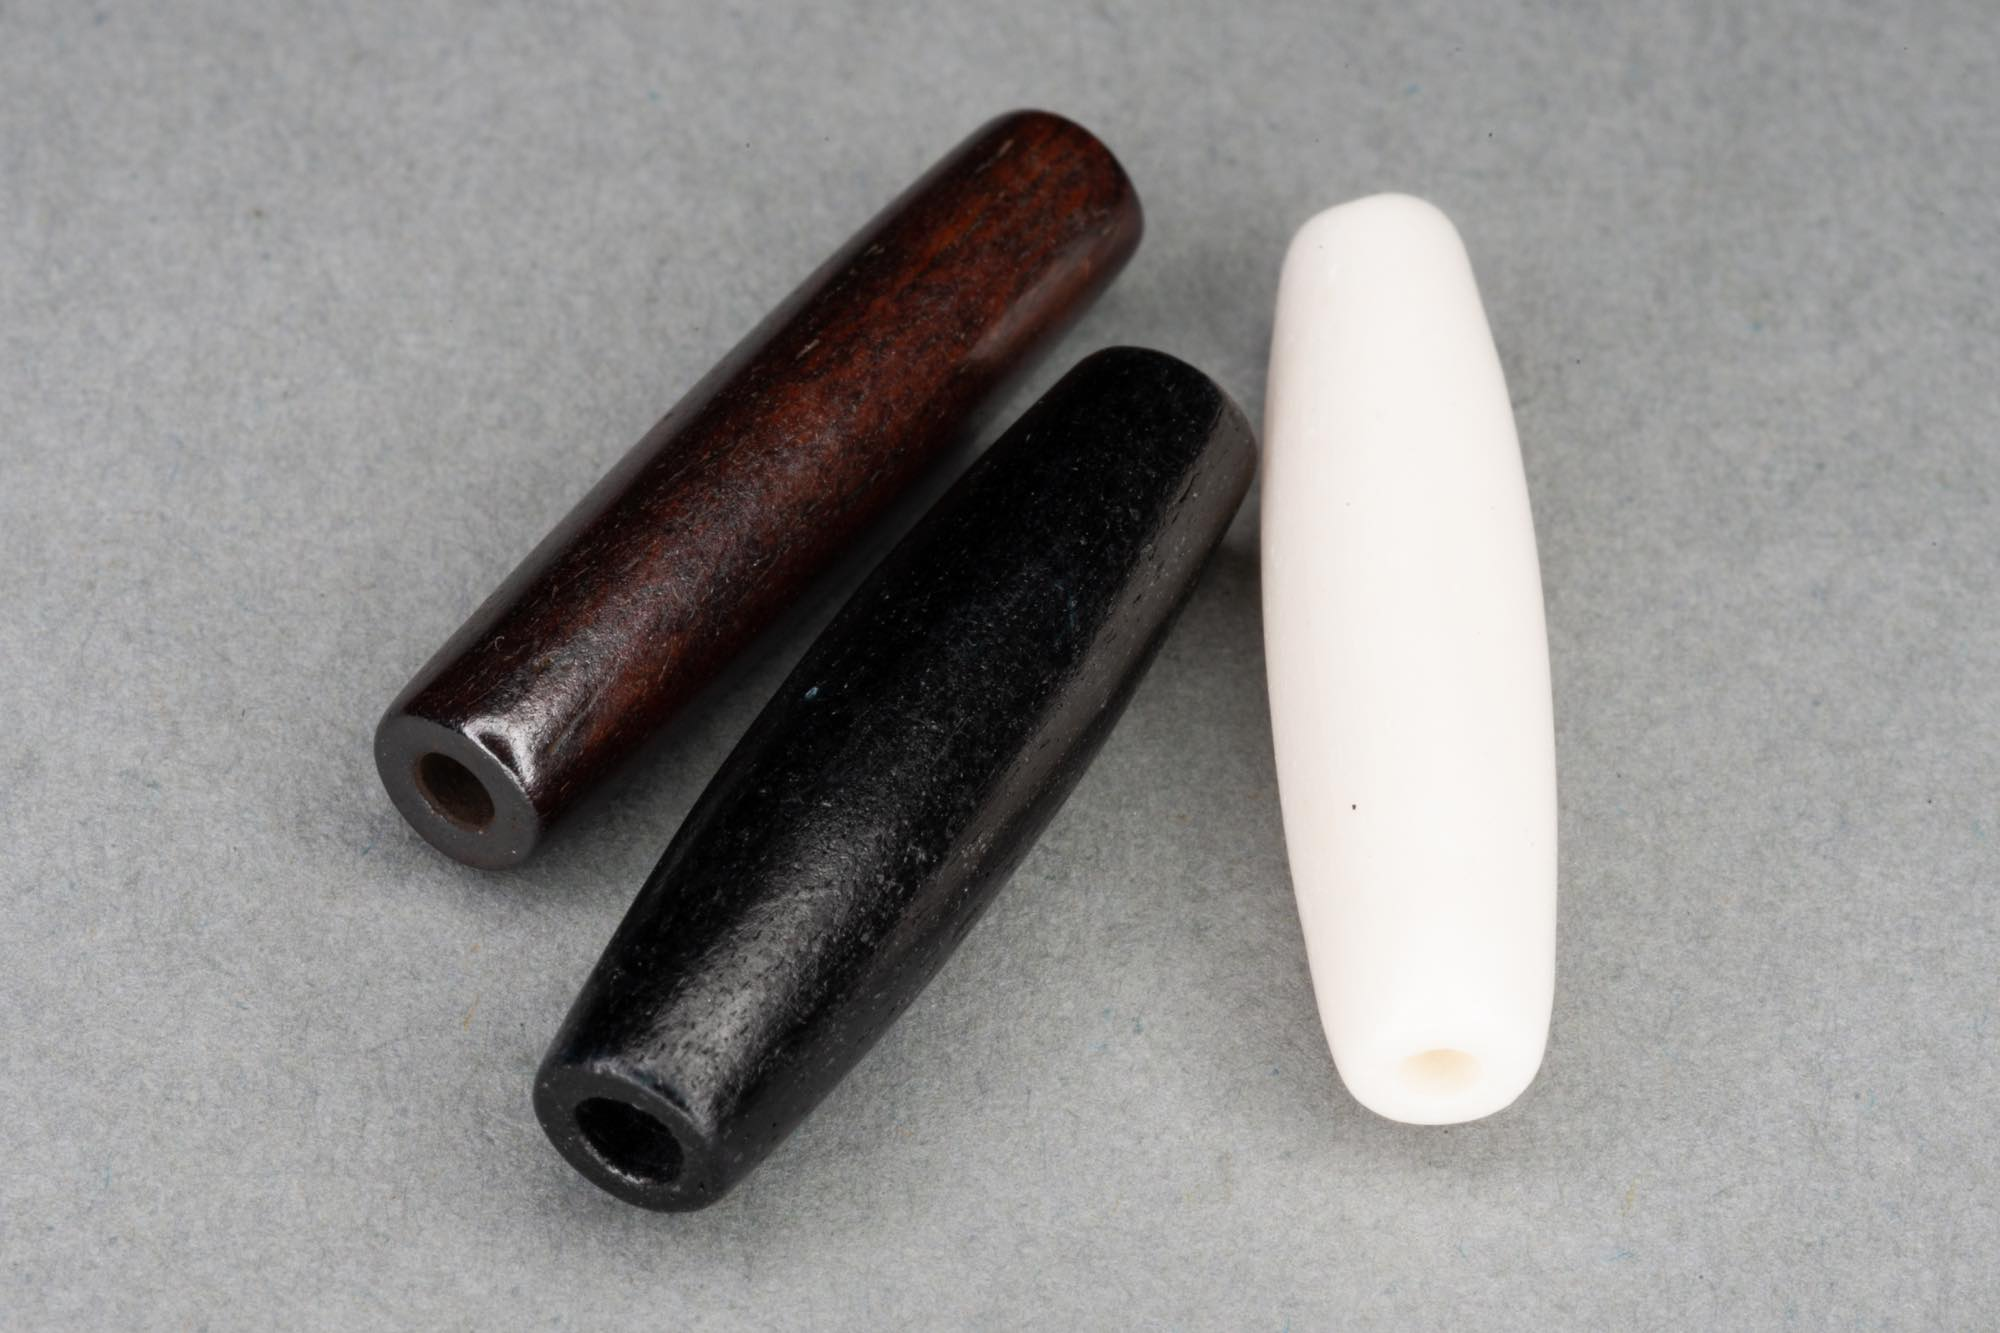 25x6mm Bone Pipes, 1mm hole